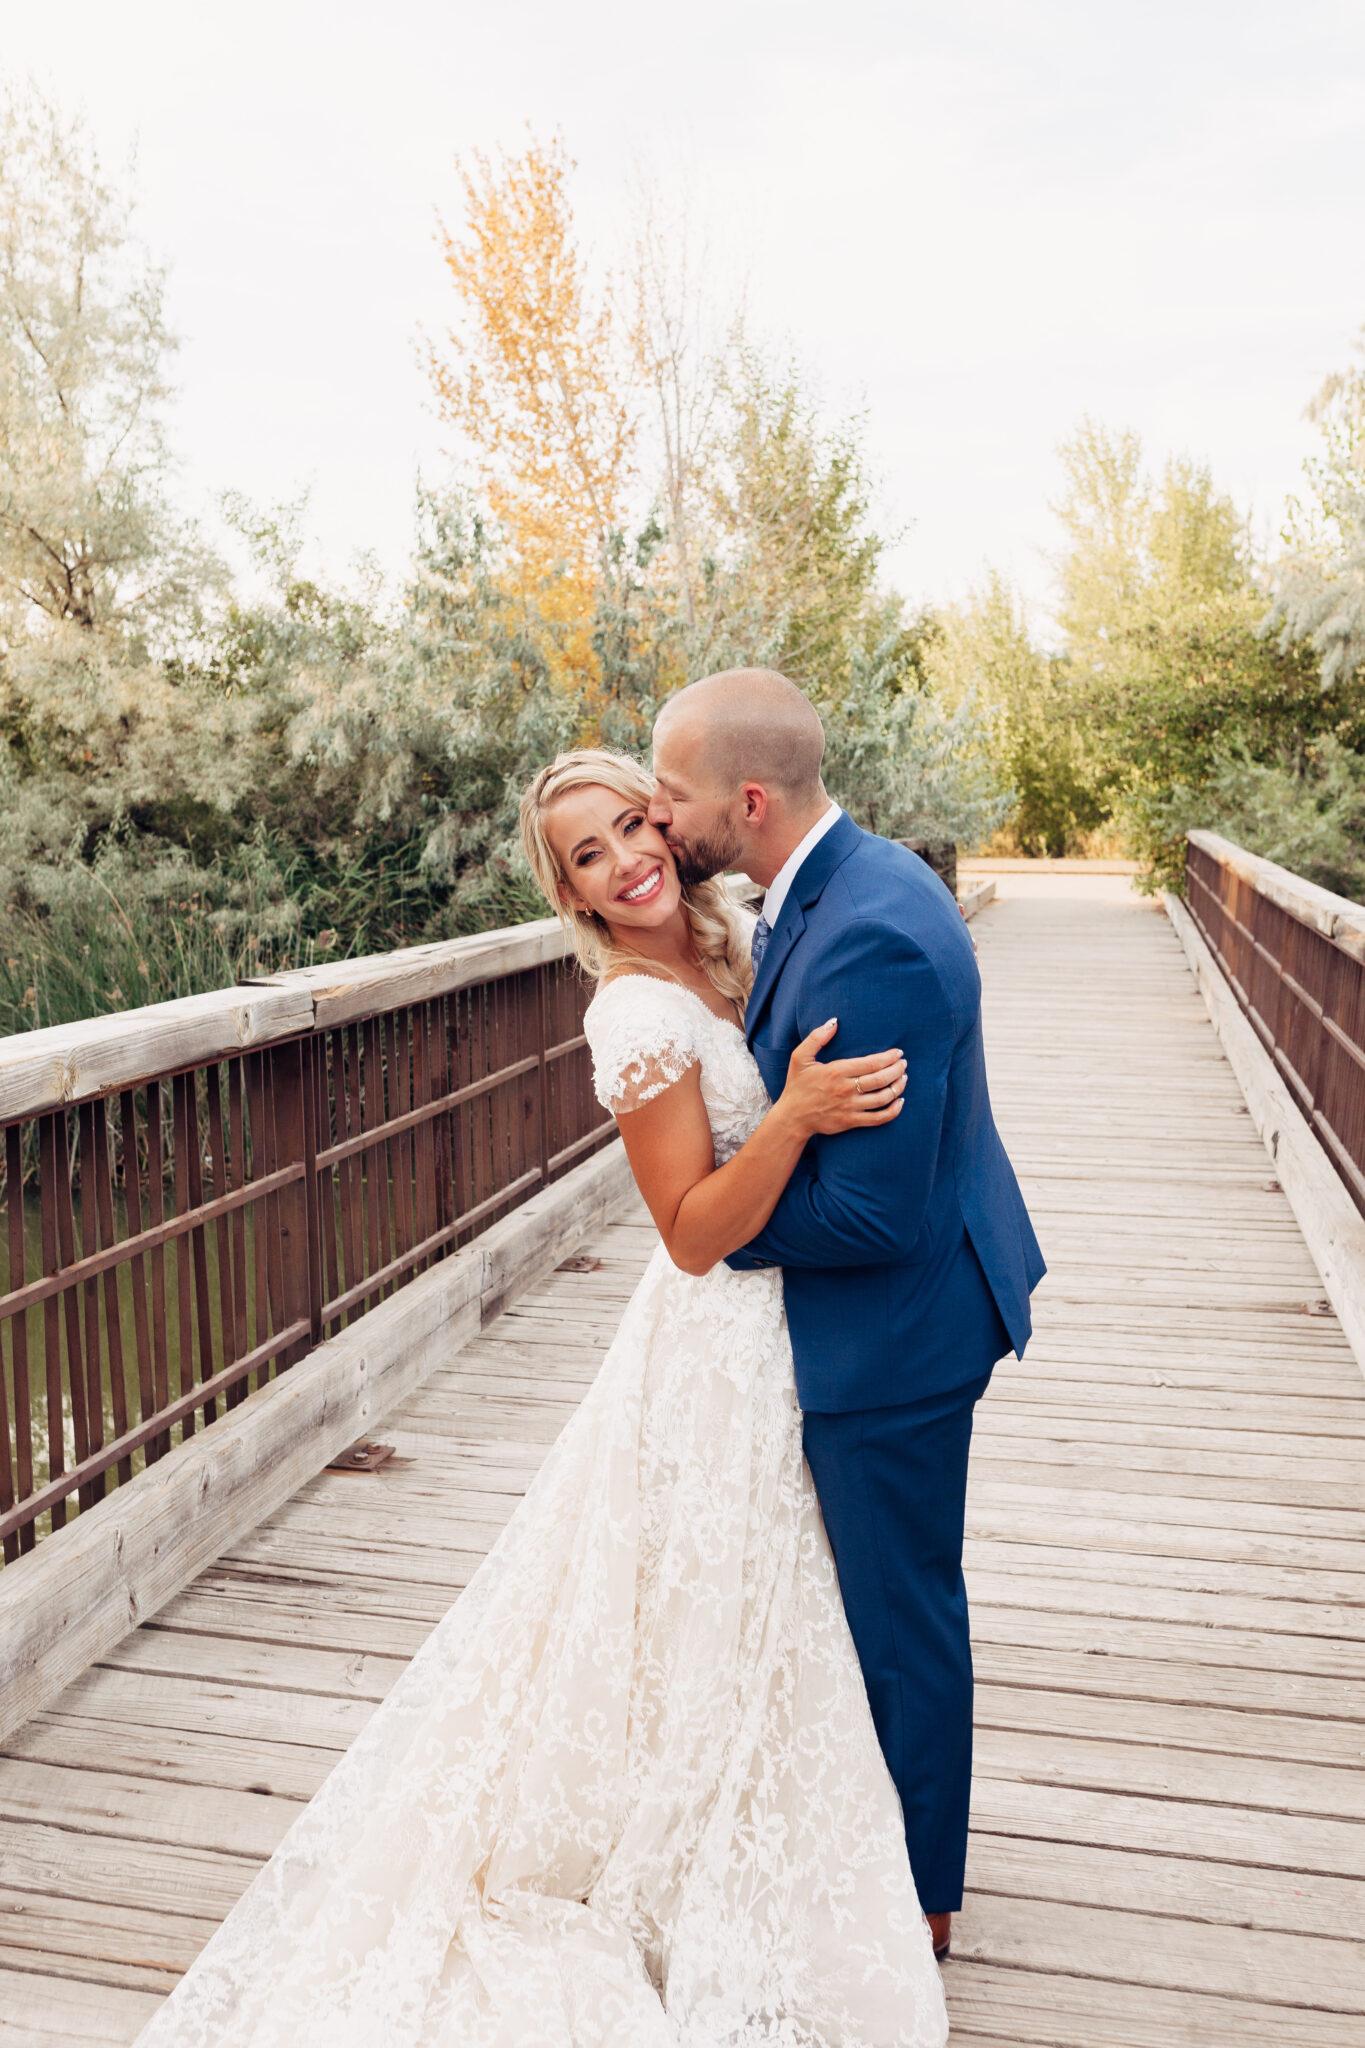 natural wedding day look twistmepretty.com